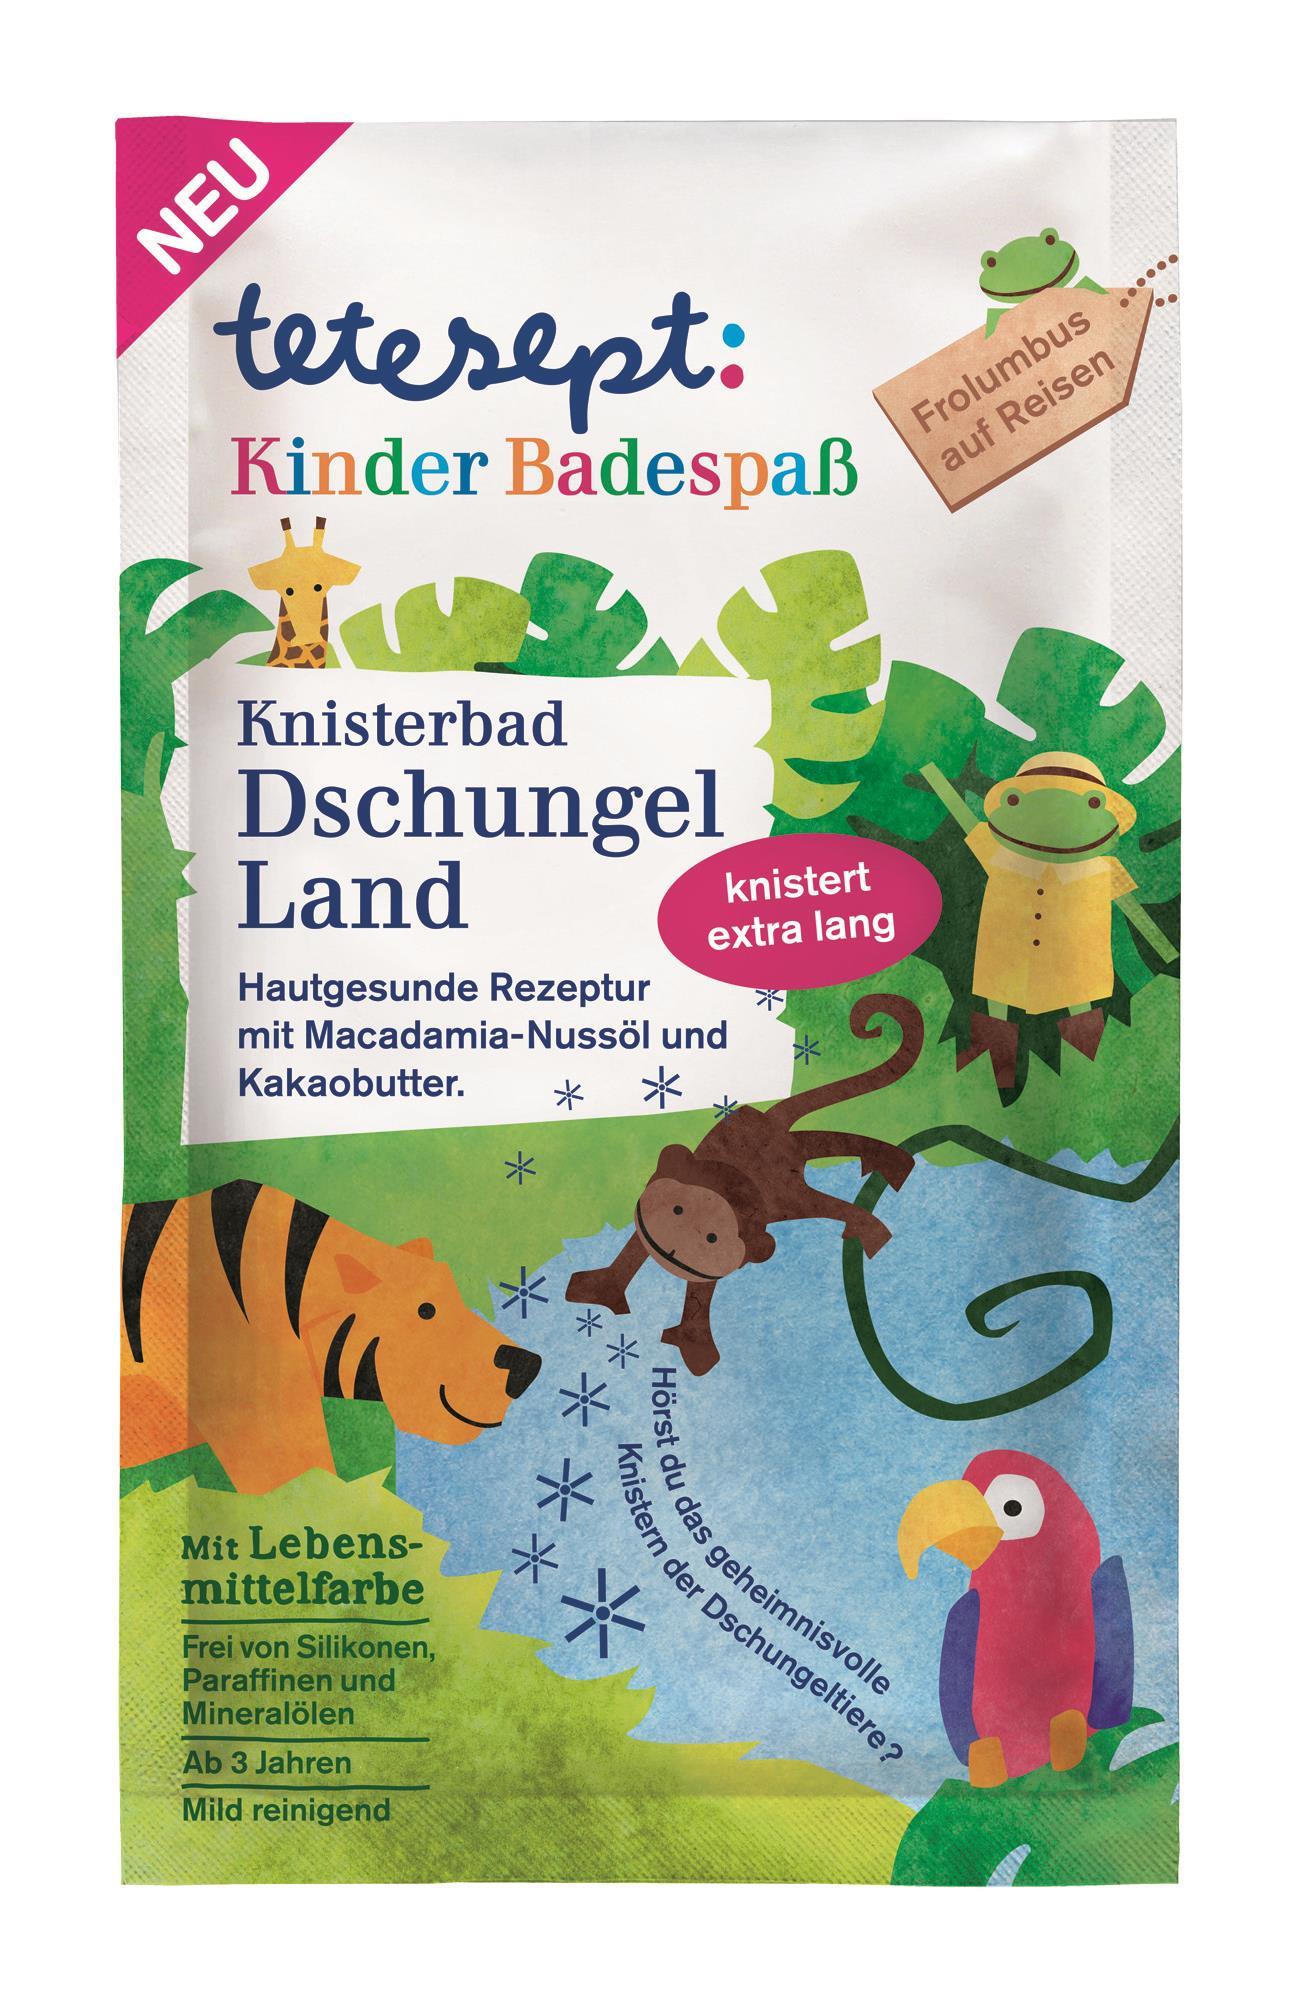 tetesept Kinderbadespass Dschungelland Knisterbad